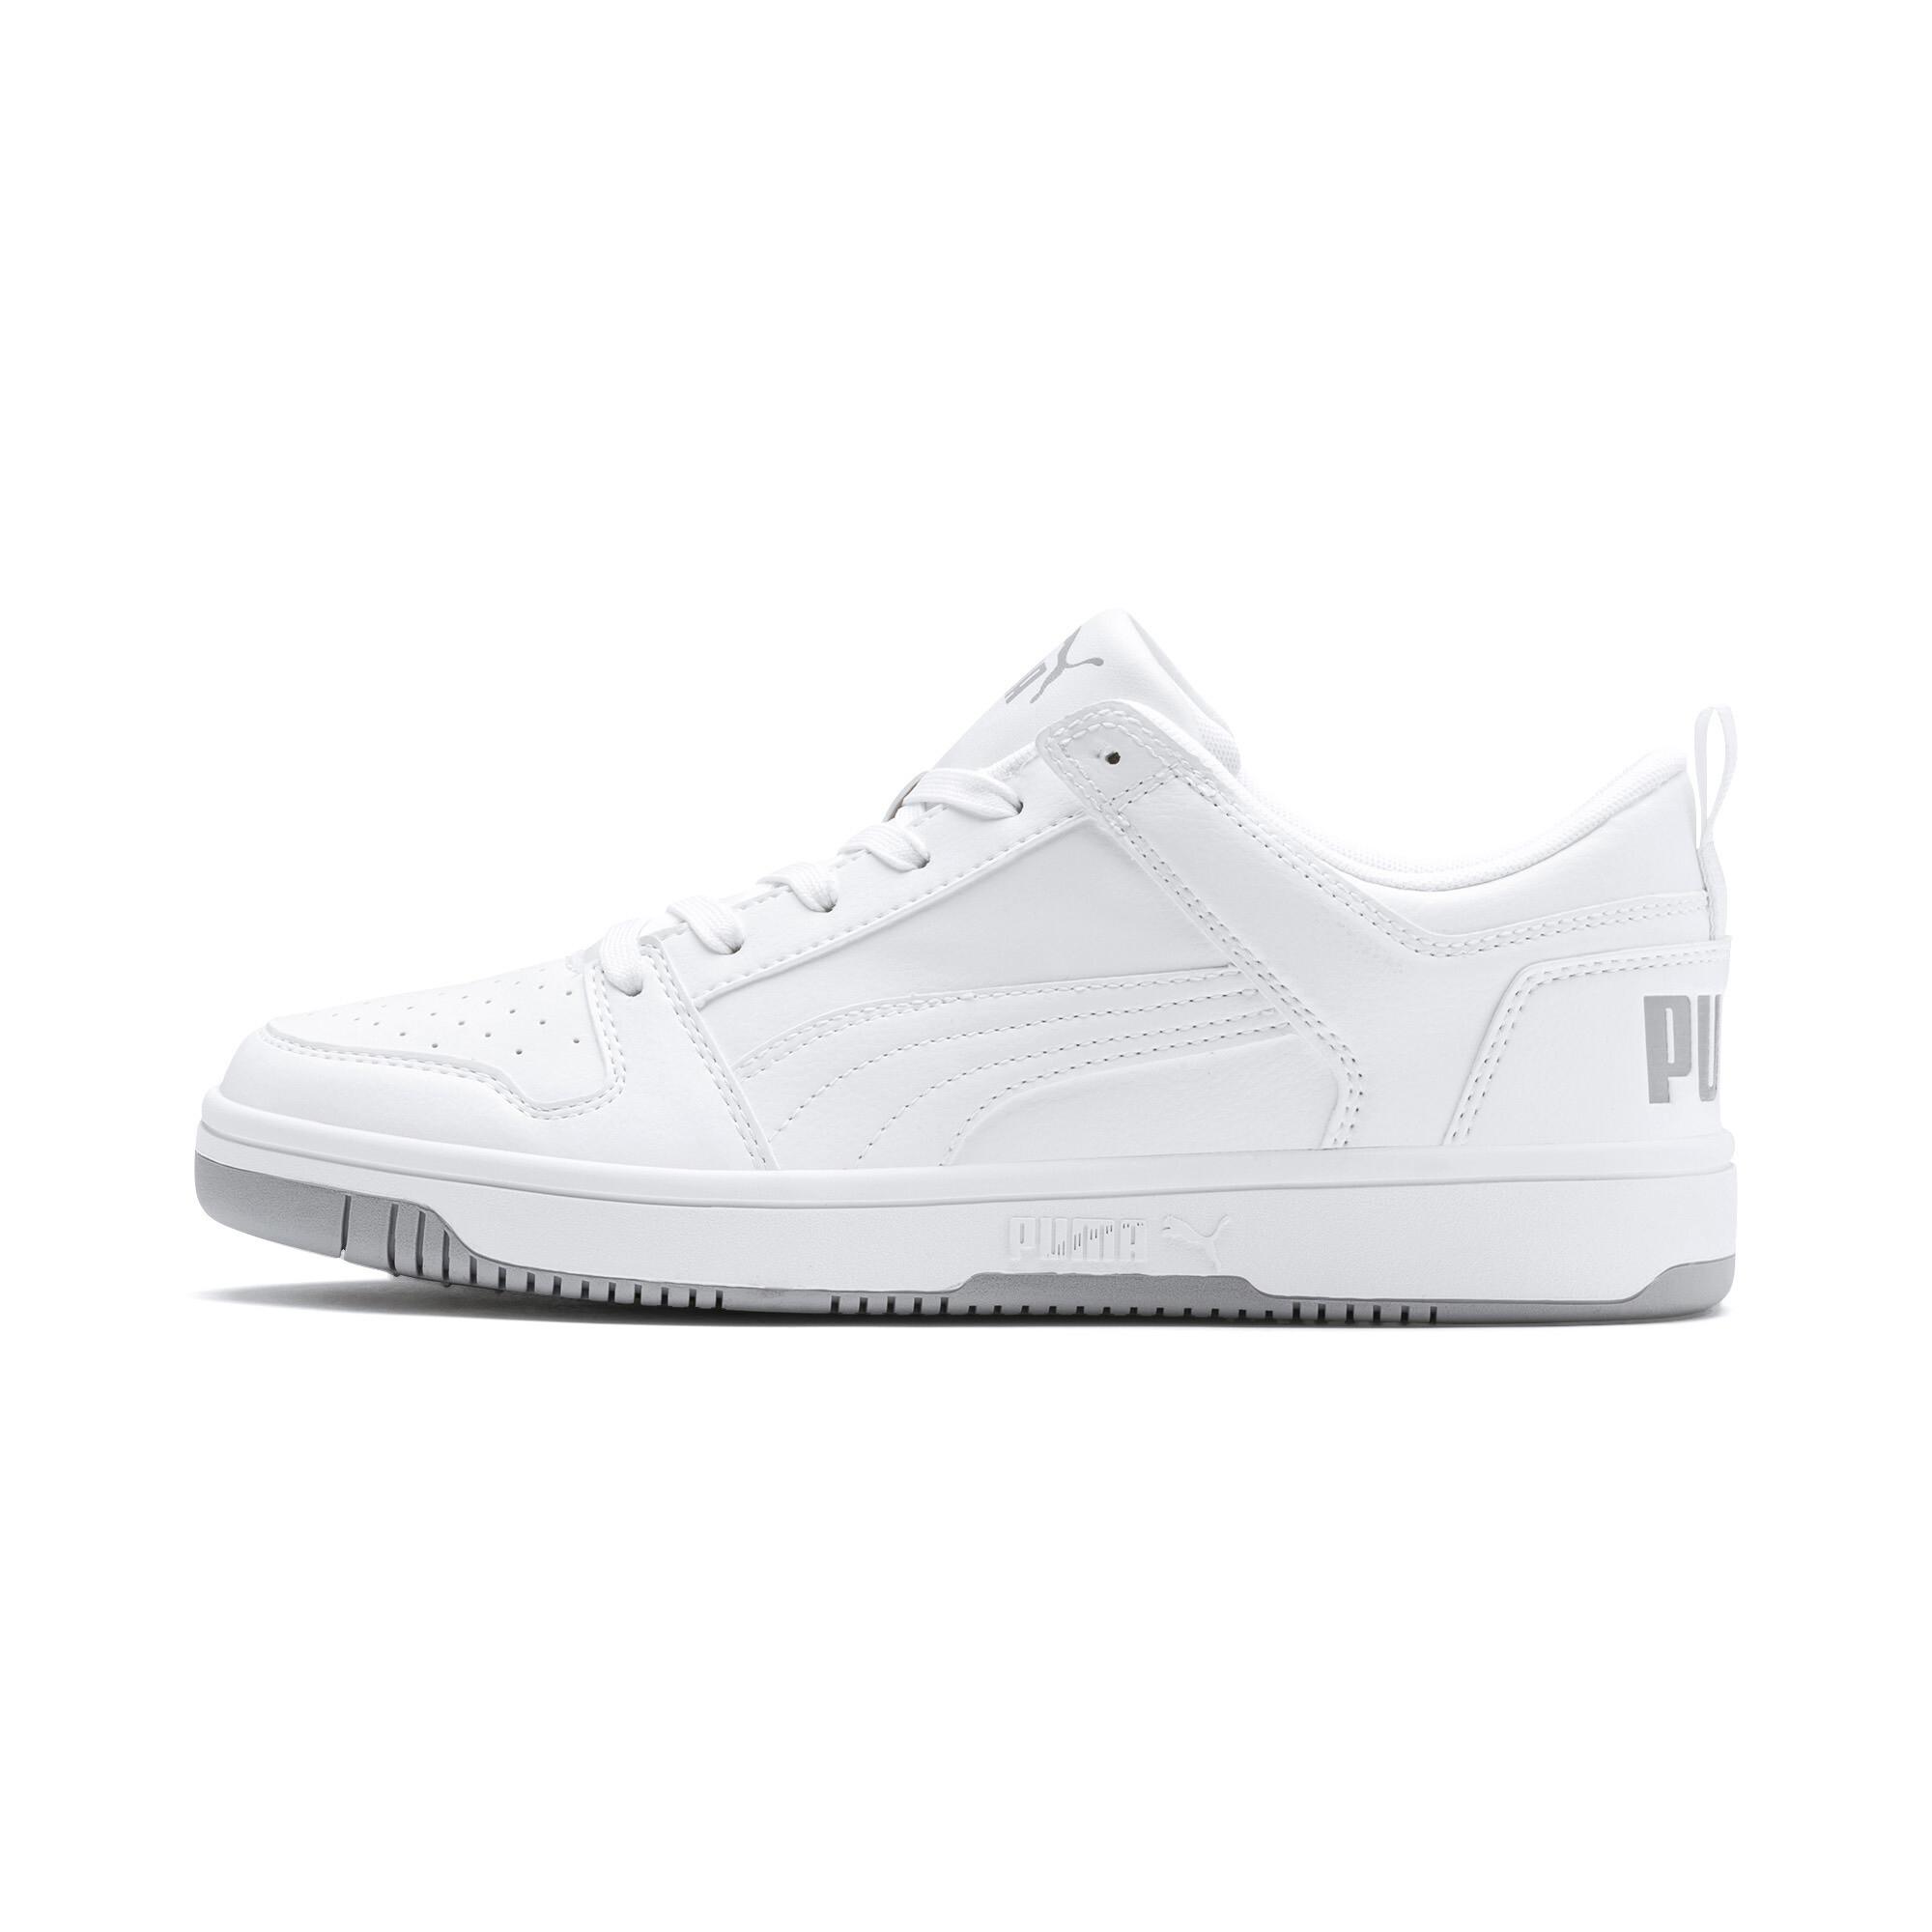 PUMA-PUMA-Rebound-LayUp-Lo-Men-039-s-Sneakers-Men-Shoe-Basics miniatura 4